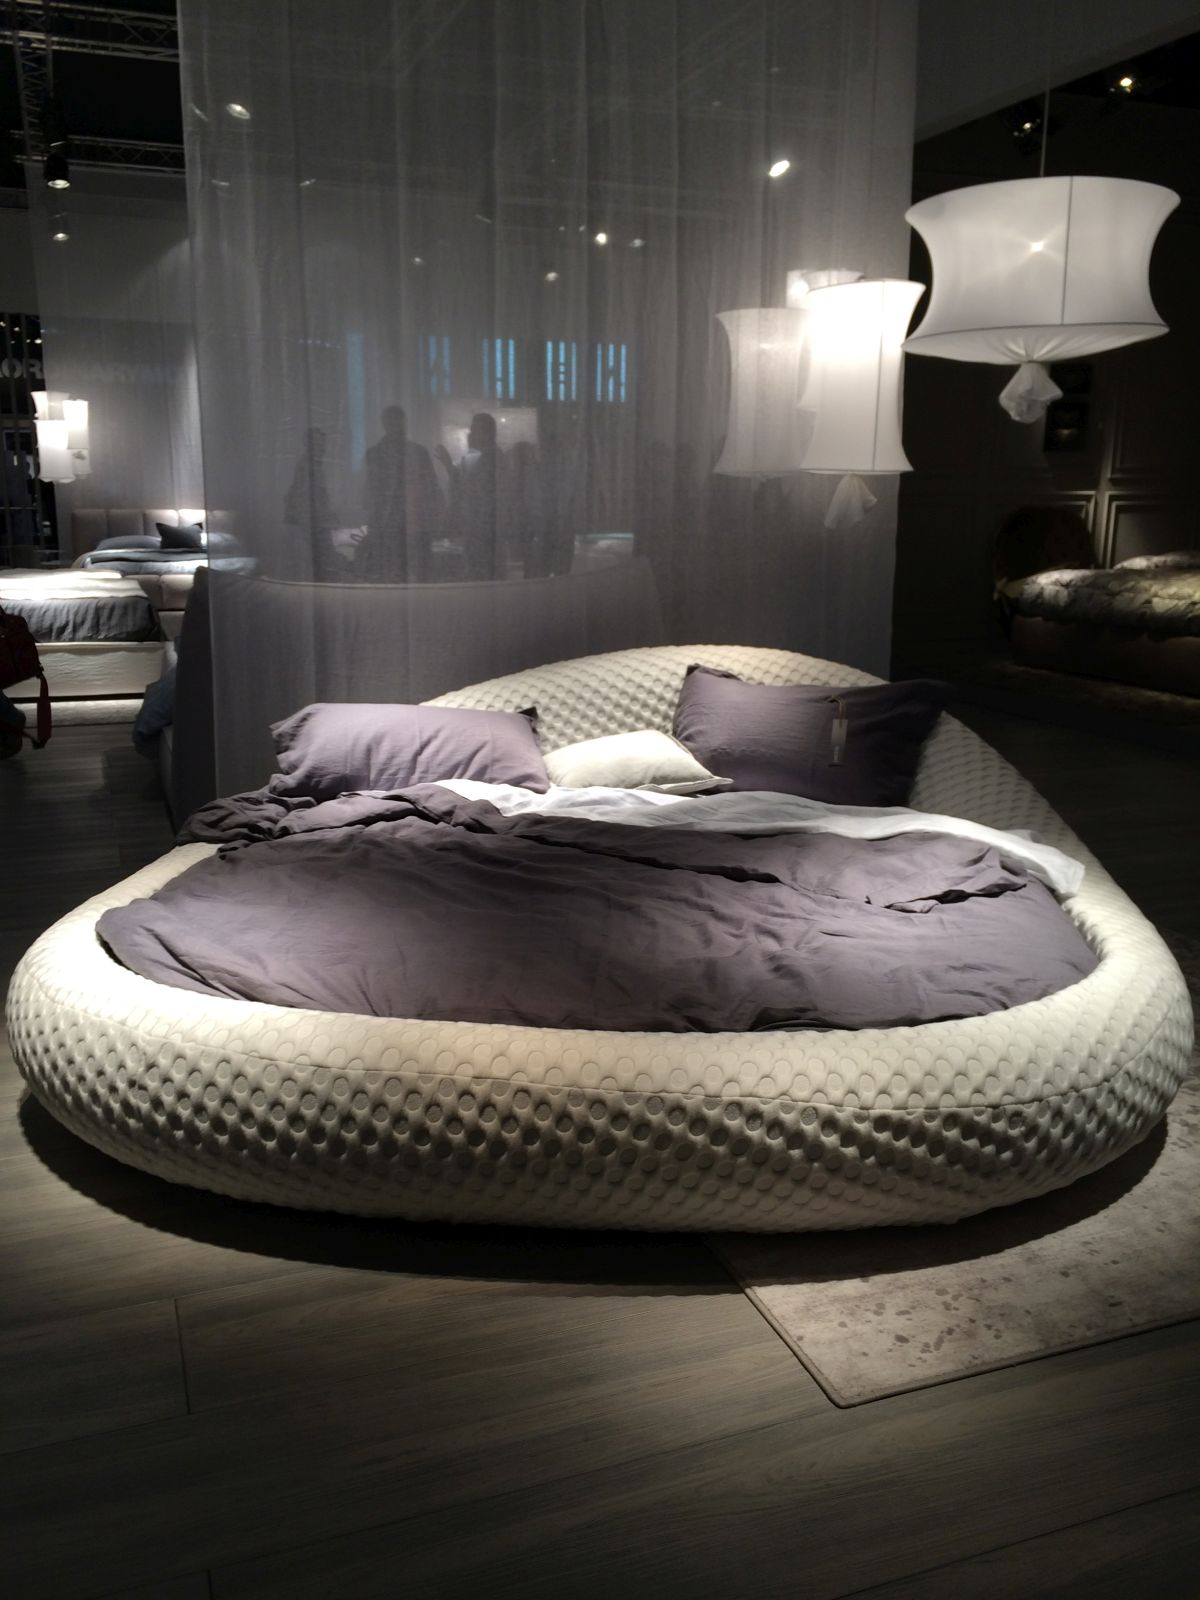 صور غرف نوم سرير دائري حديث مودرن فخم ميكساتك